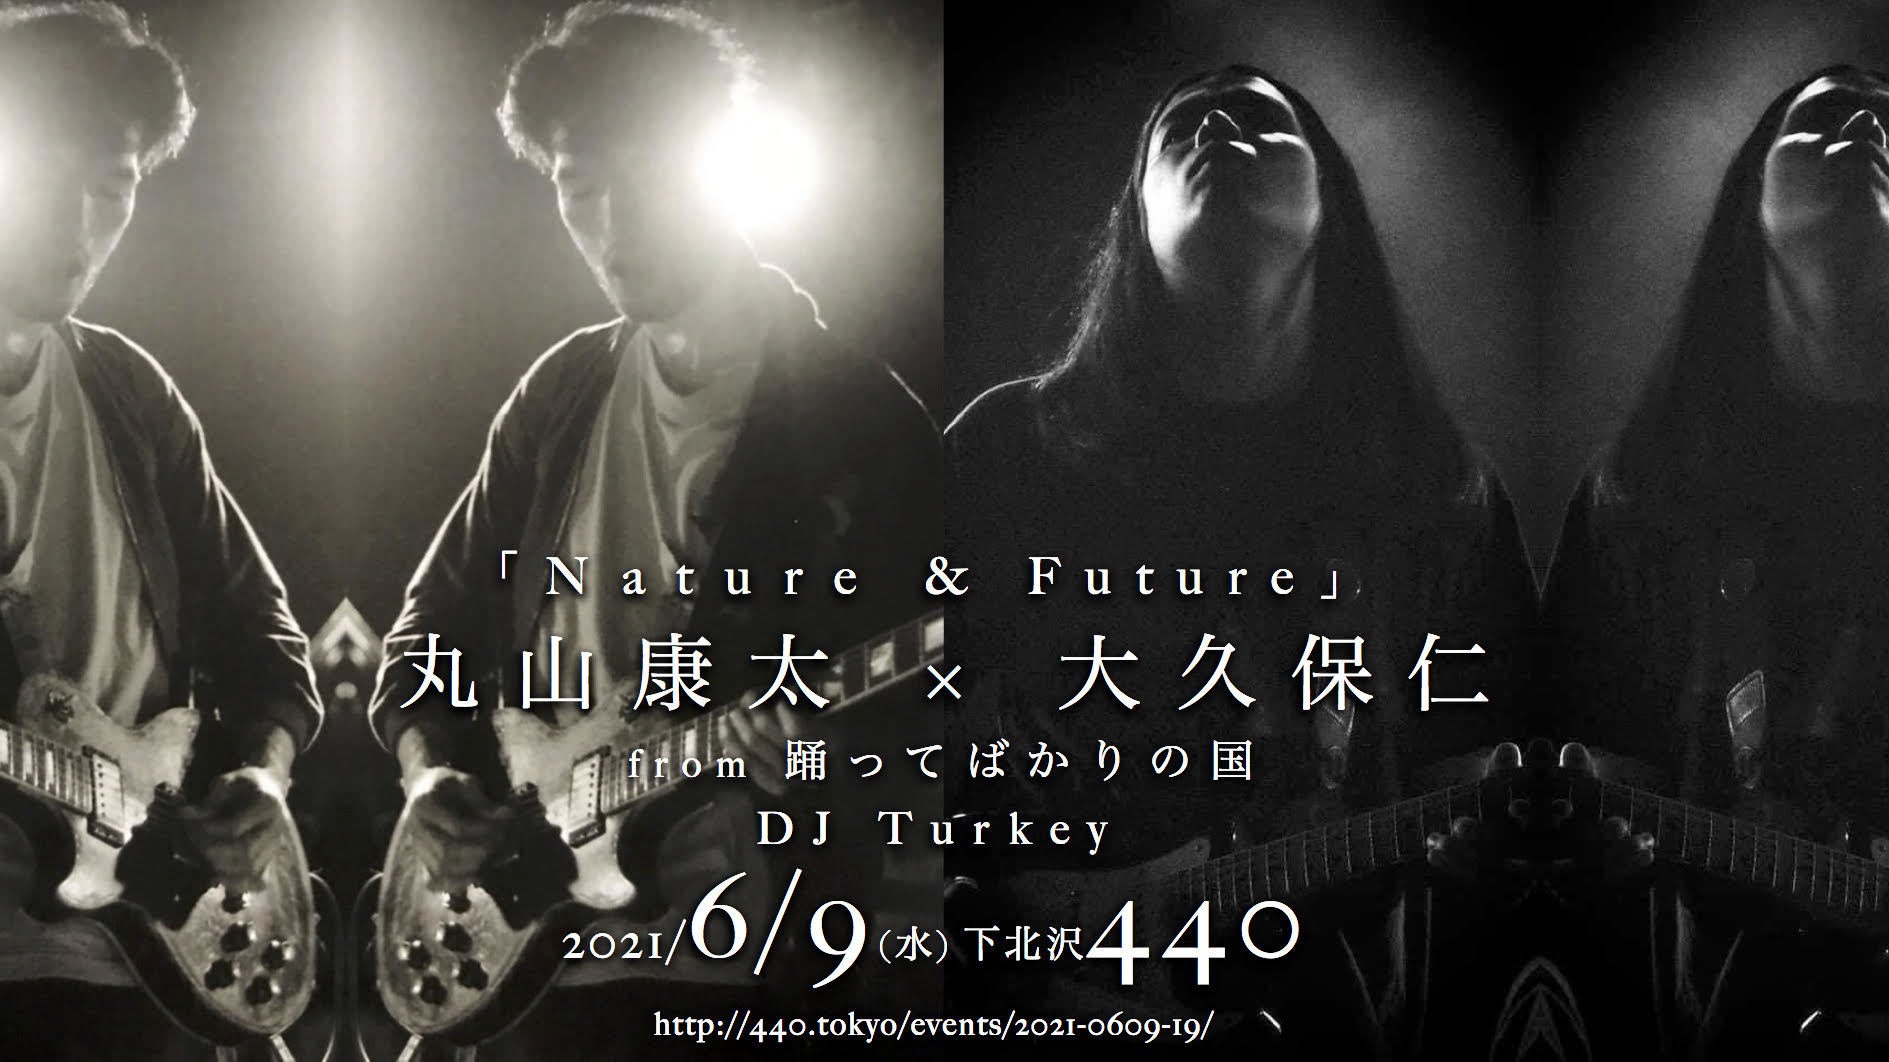 『Nature & Future』フライヤー